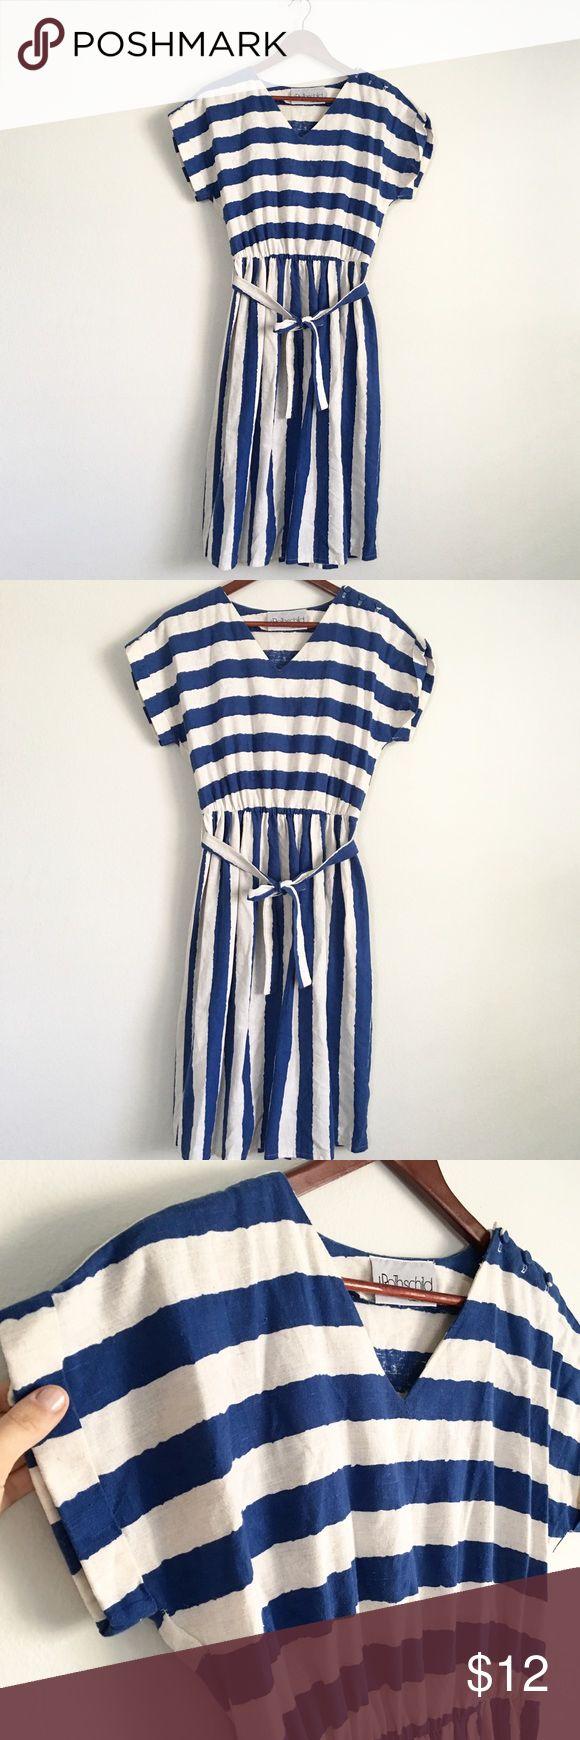 Vintage Linen Striped Dress Adorable and classic vintage striped linen dress. Nautical feel with option tie around belt. First m/l best Dresses